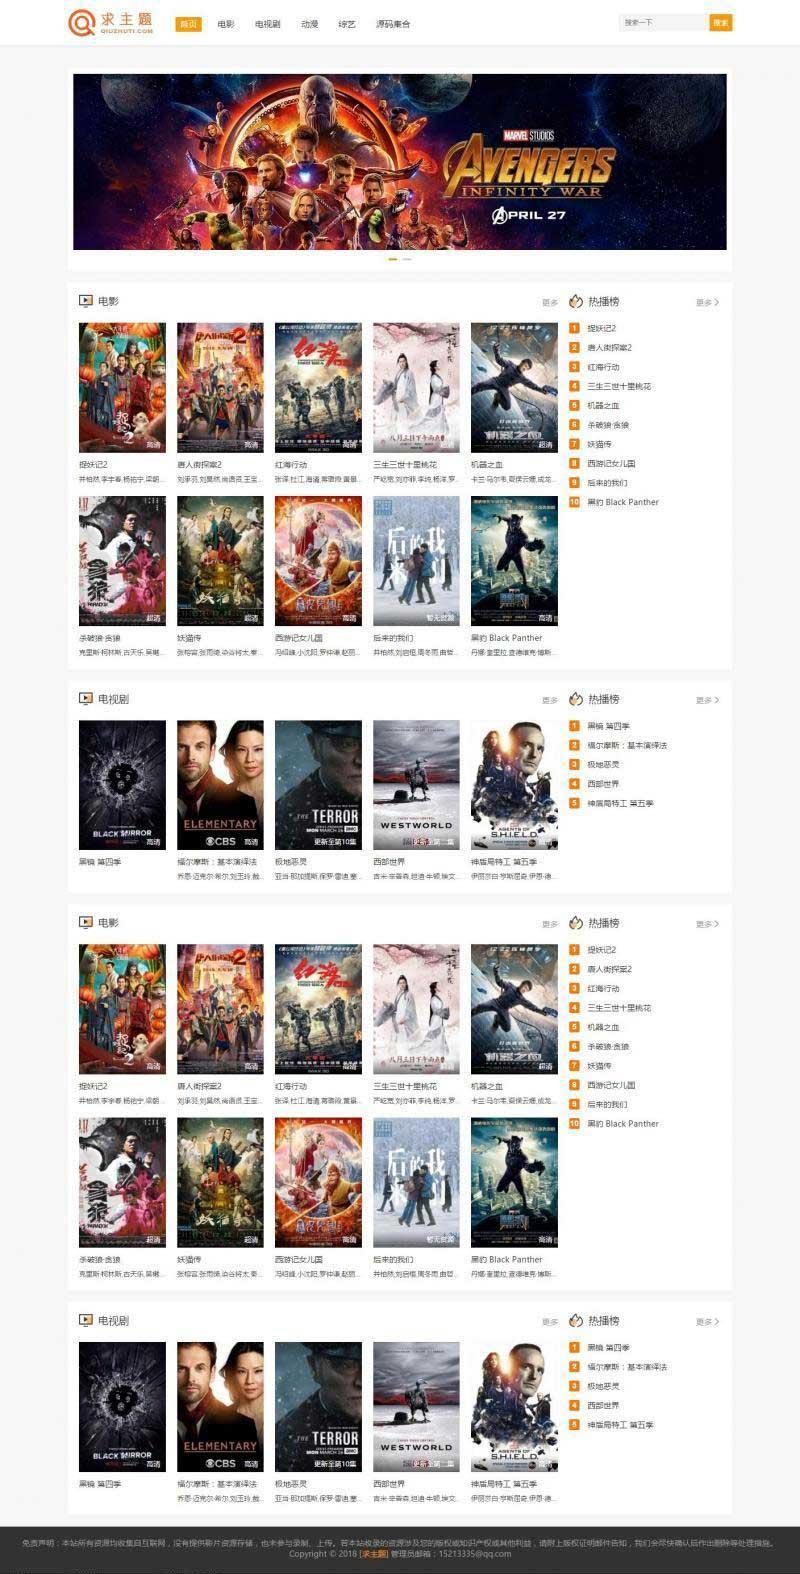 WordPress主题zmovie模板,1.0版本电影视频资源下载网站主题,已测试插图(1)